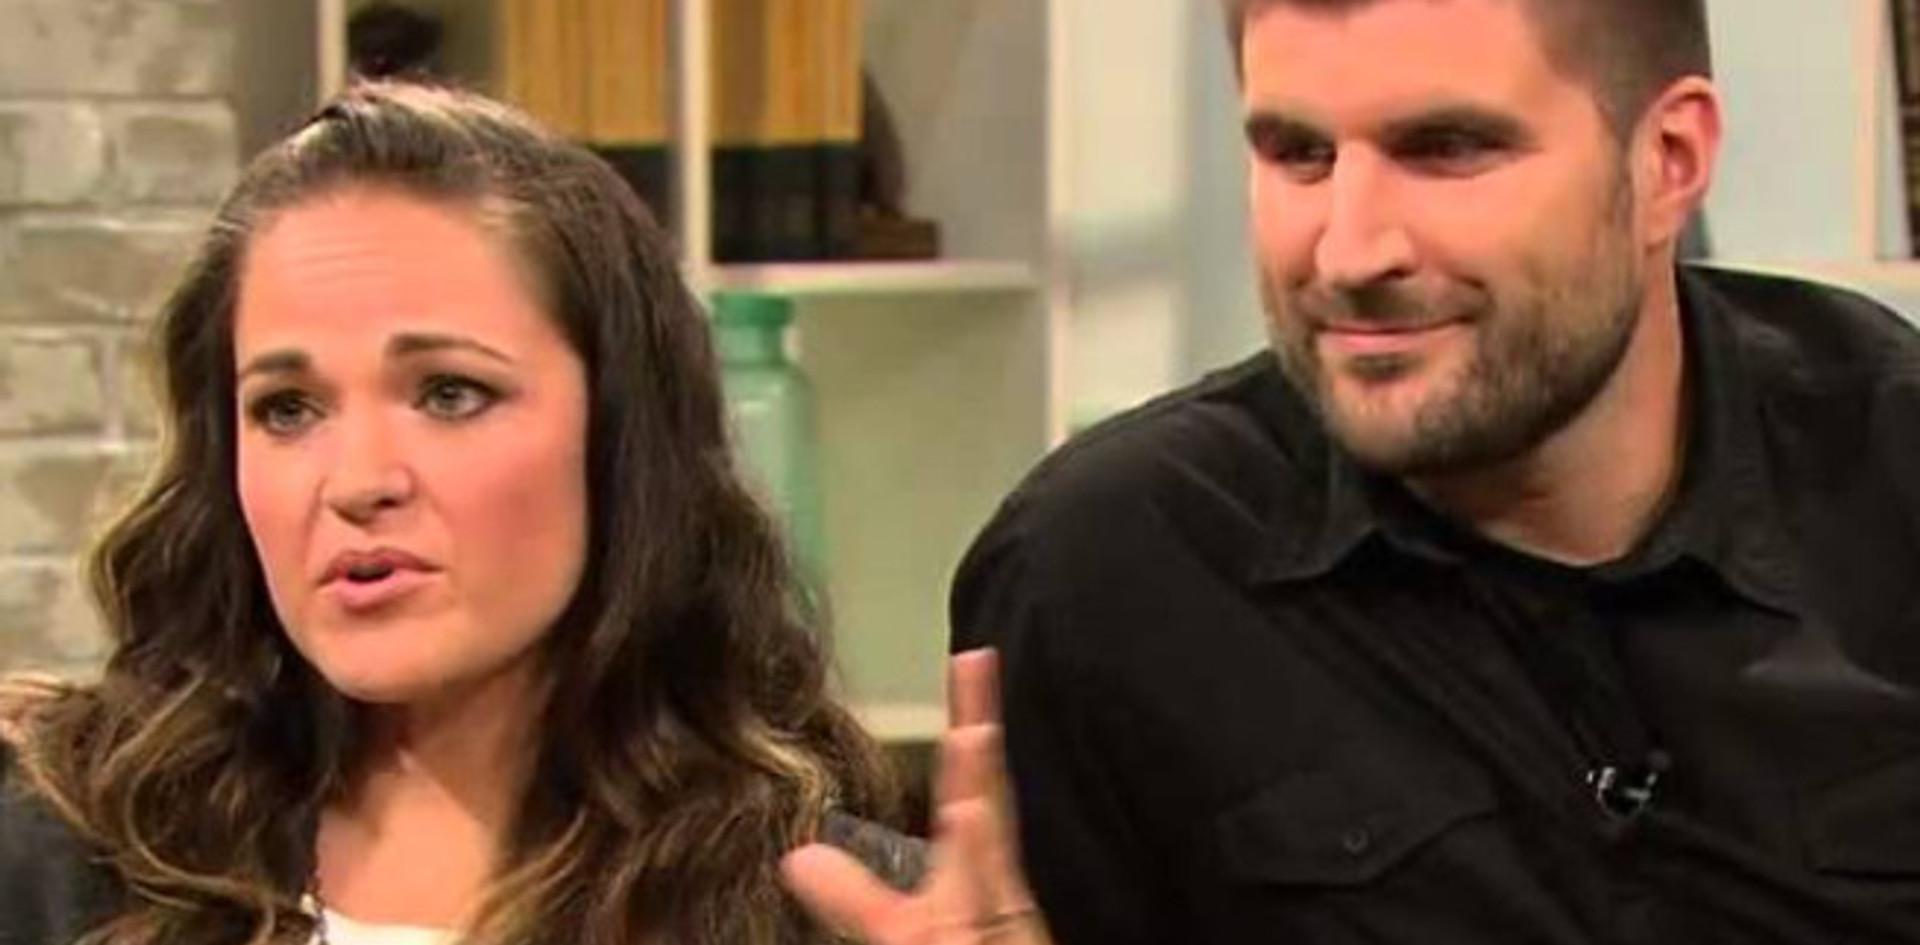 LIFELINE TODAY | Season 3, Episode 76 | Bruce & Laura Merz